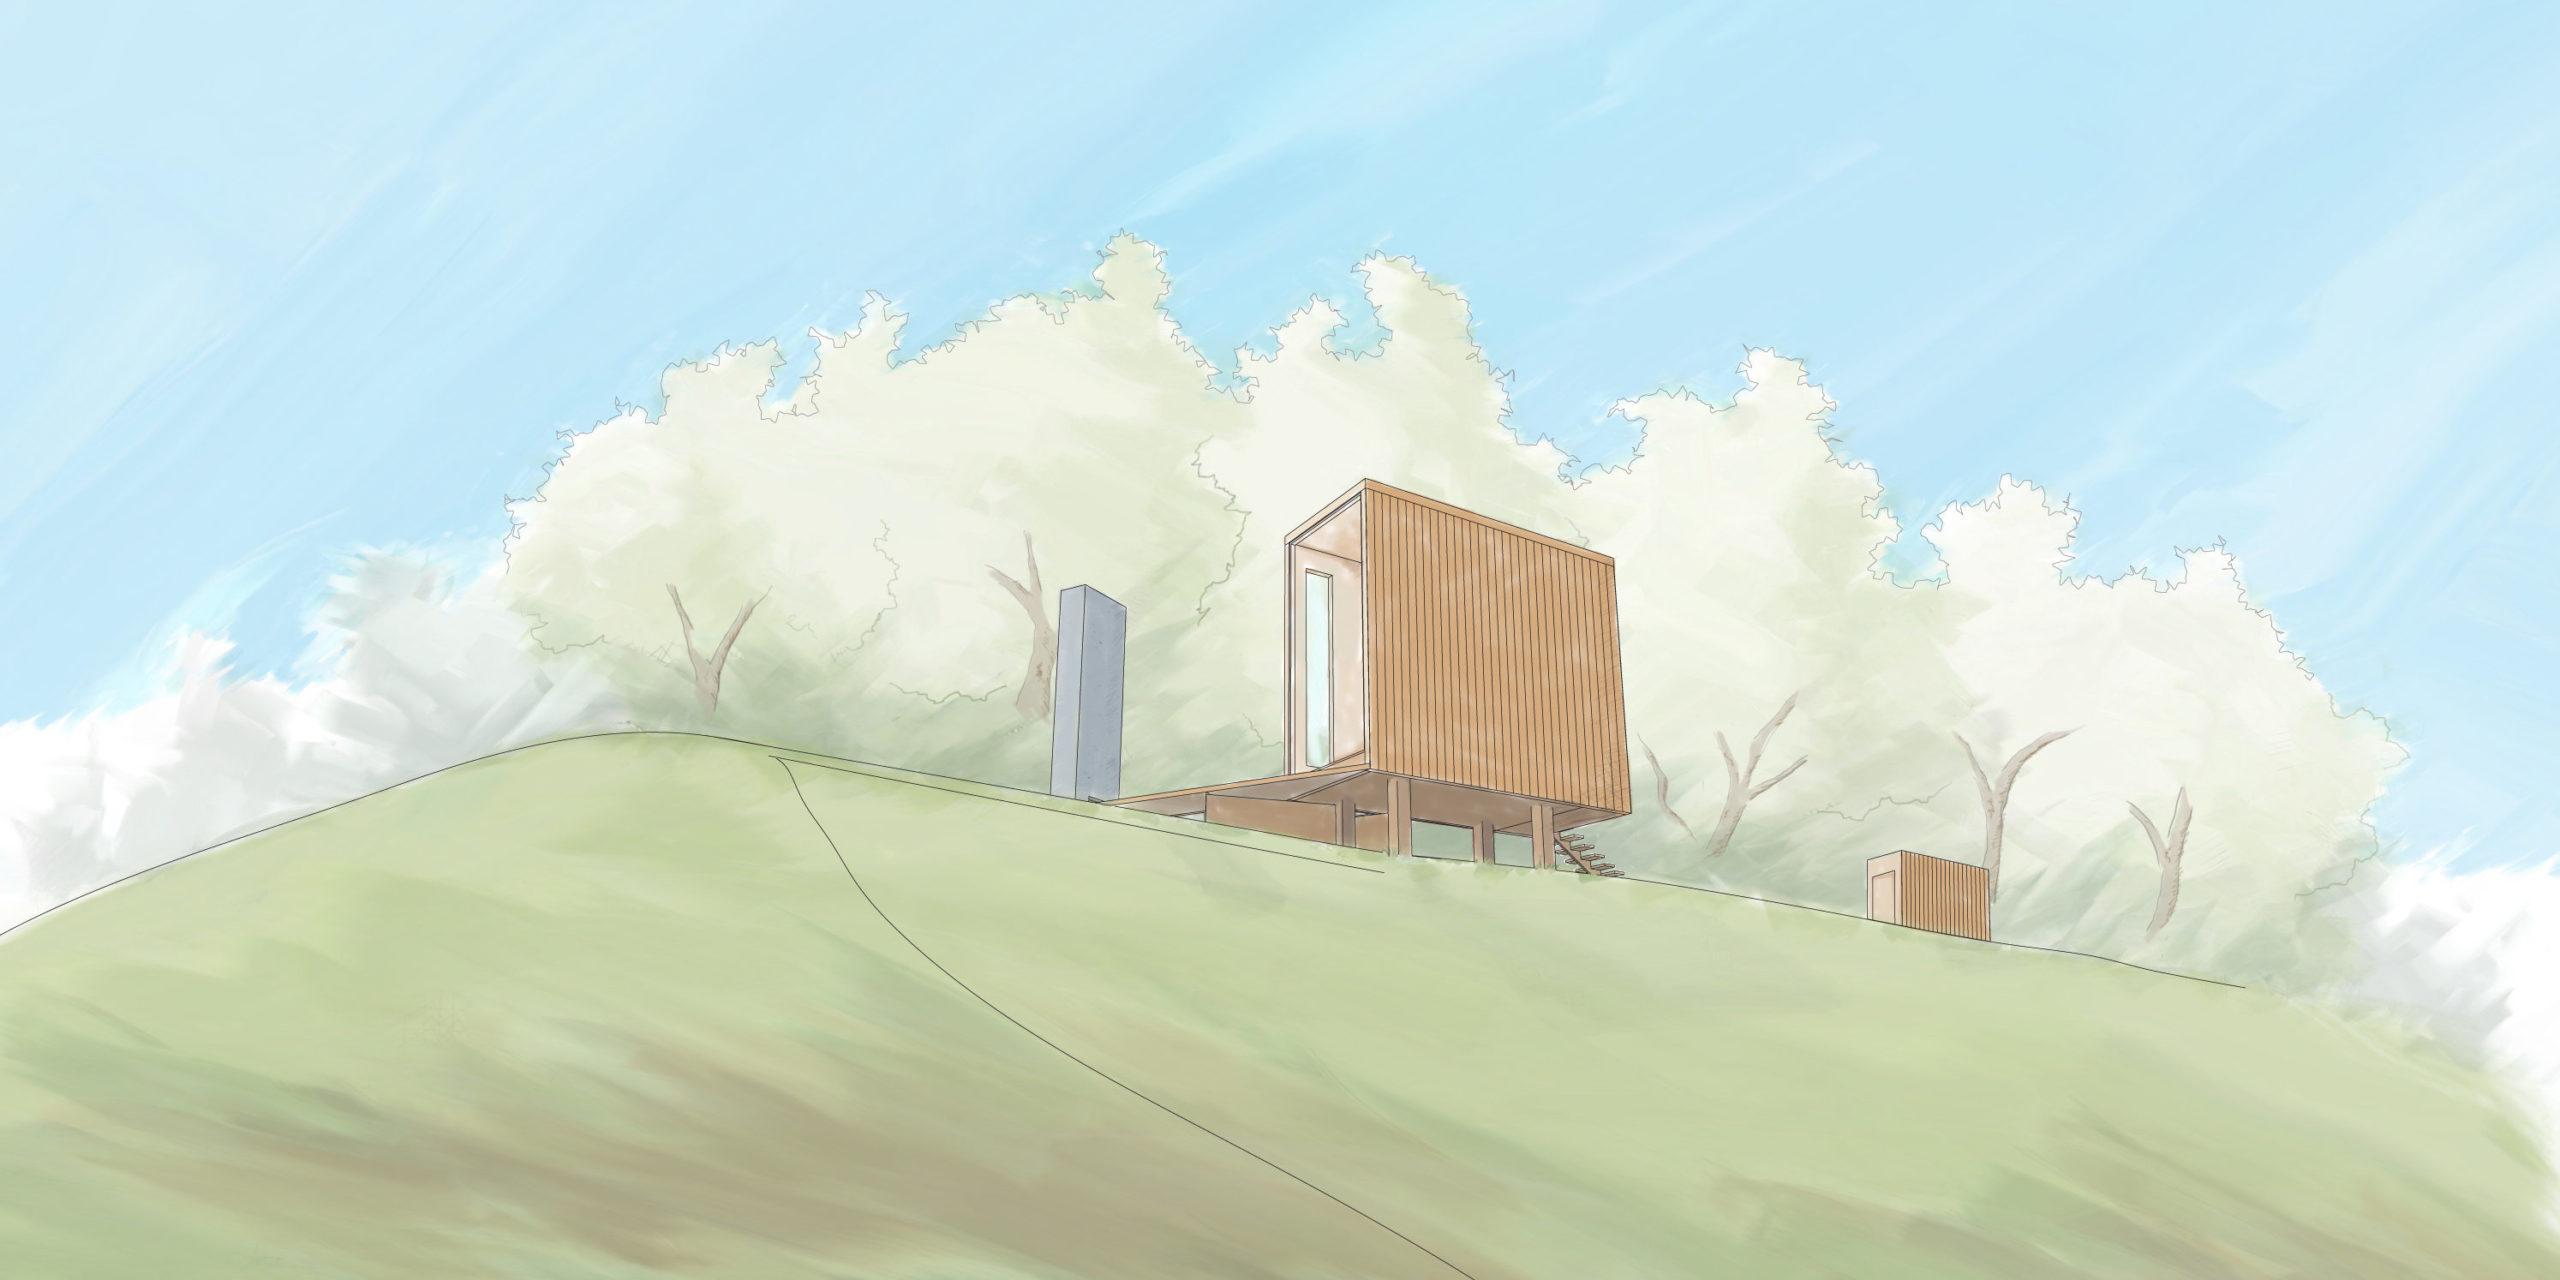 Lake Hartwell Cabin rendering for Lightroom Studio